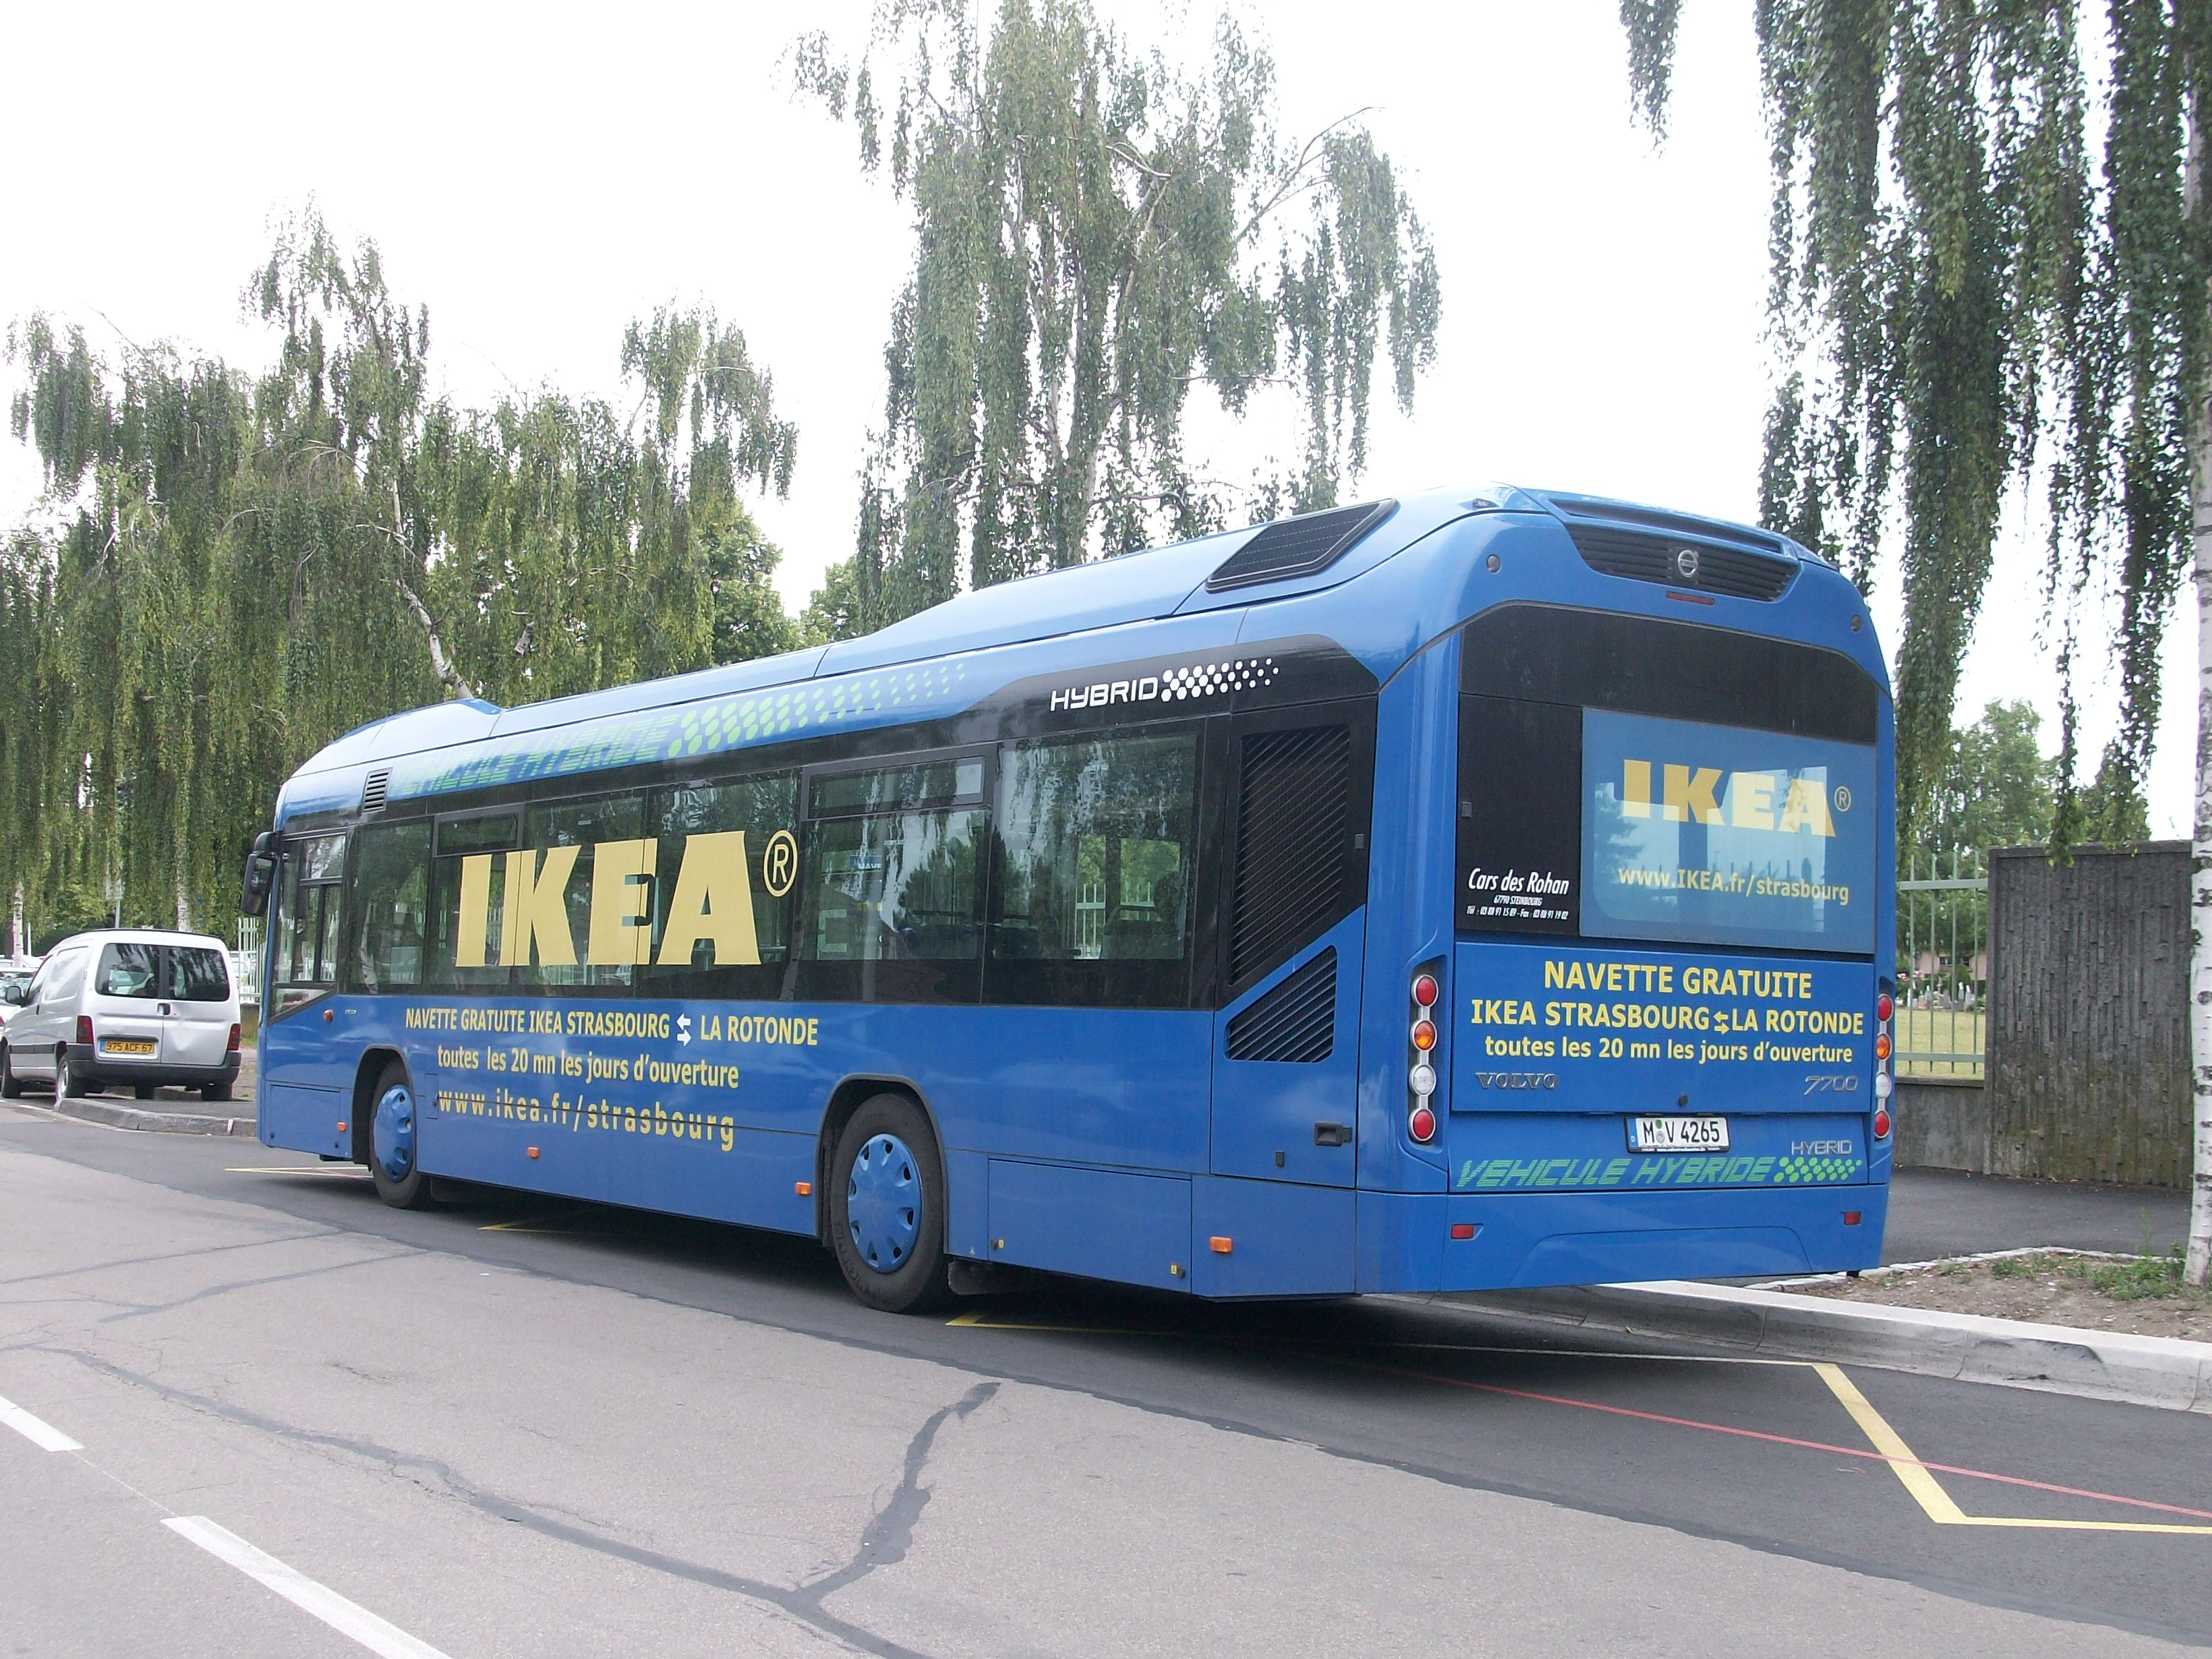 Ikea Strasbourg Sapin dedans file:volvo 7700 hybride ikea strasbourg - 3 - wikimedia commons